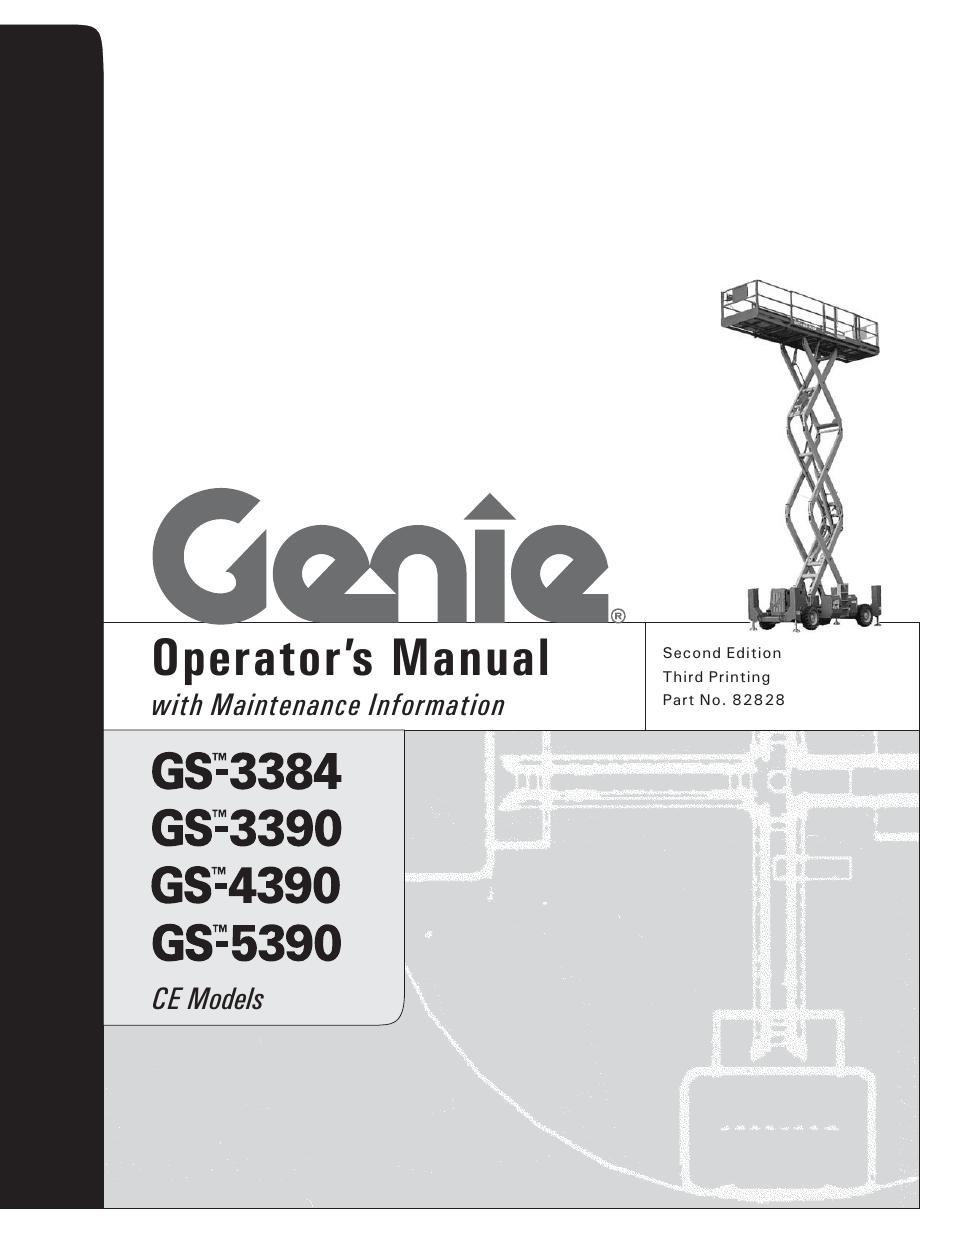 genie gs 5390 user manual 36 pages also for gs 3390 gs 4390 rh manualsdir com Genie Pro Screw Drive Manual Genie Service Manual